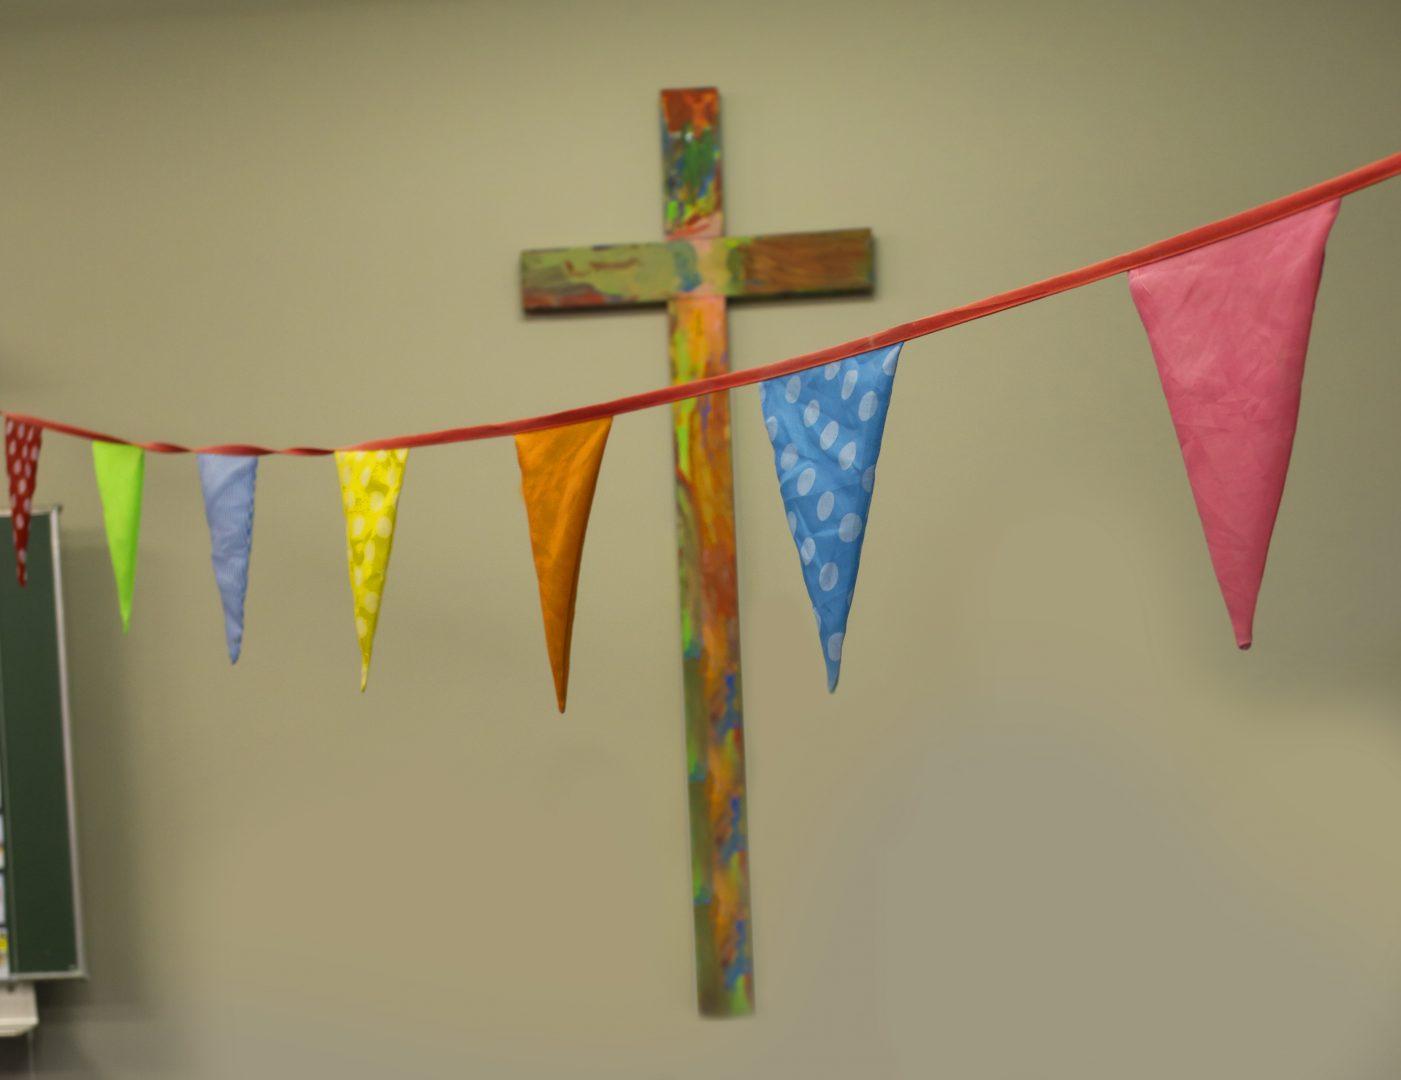 Vlaggetjes met kruis